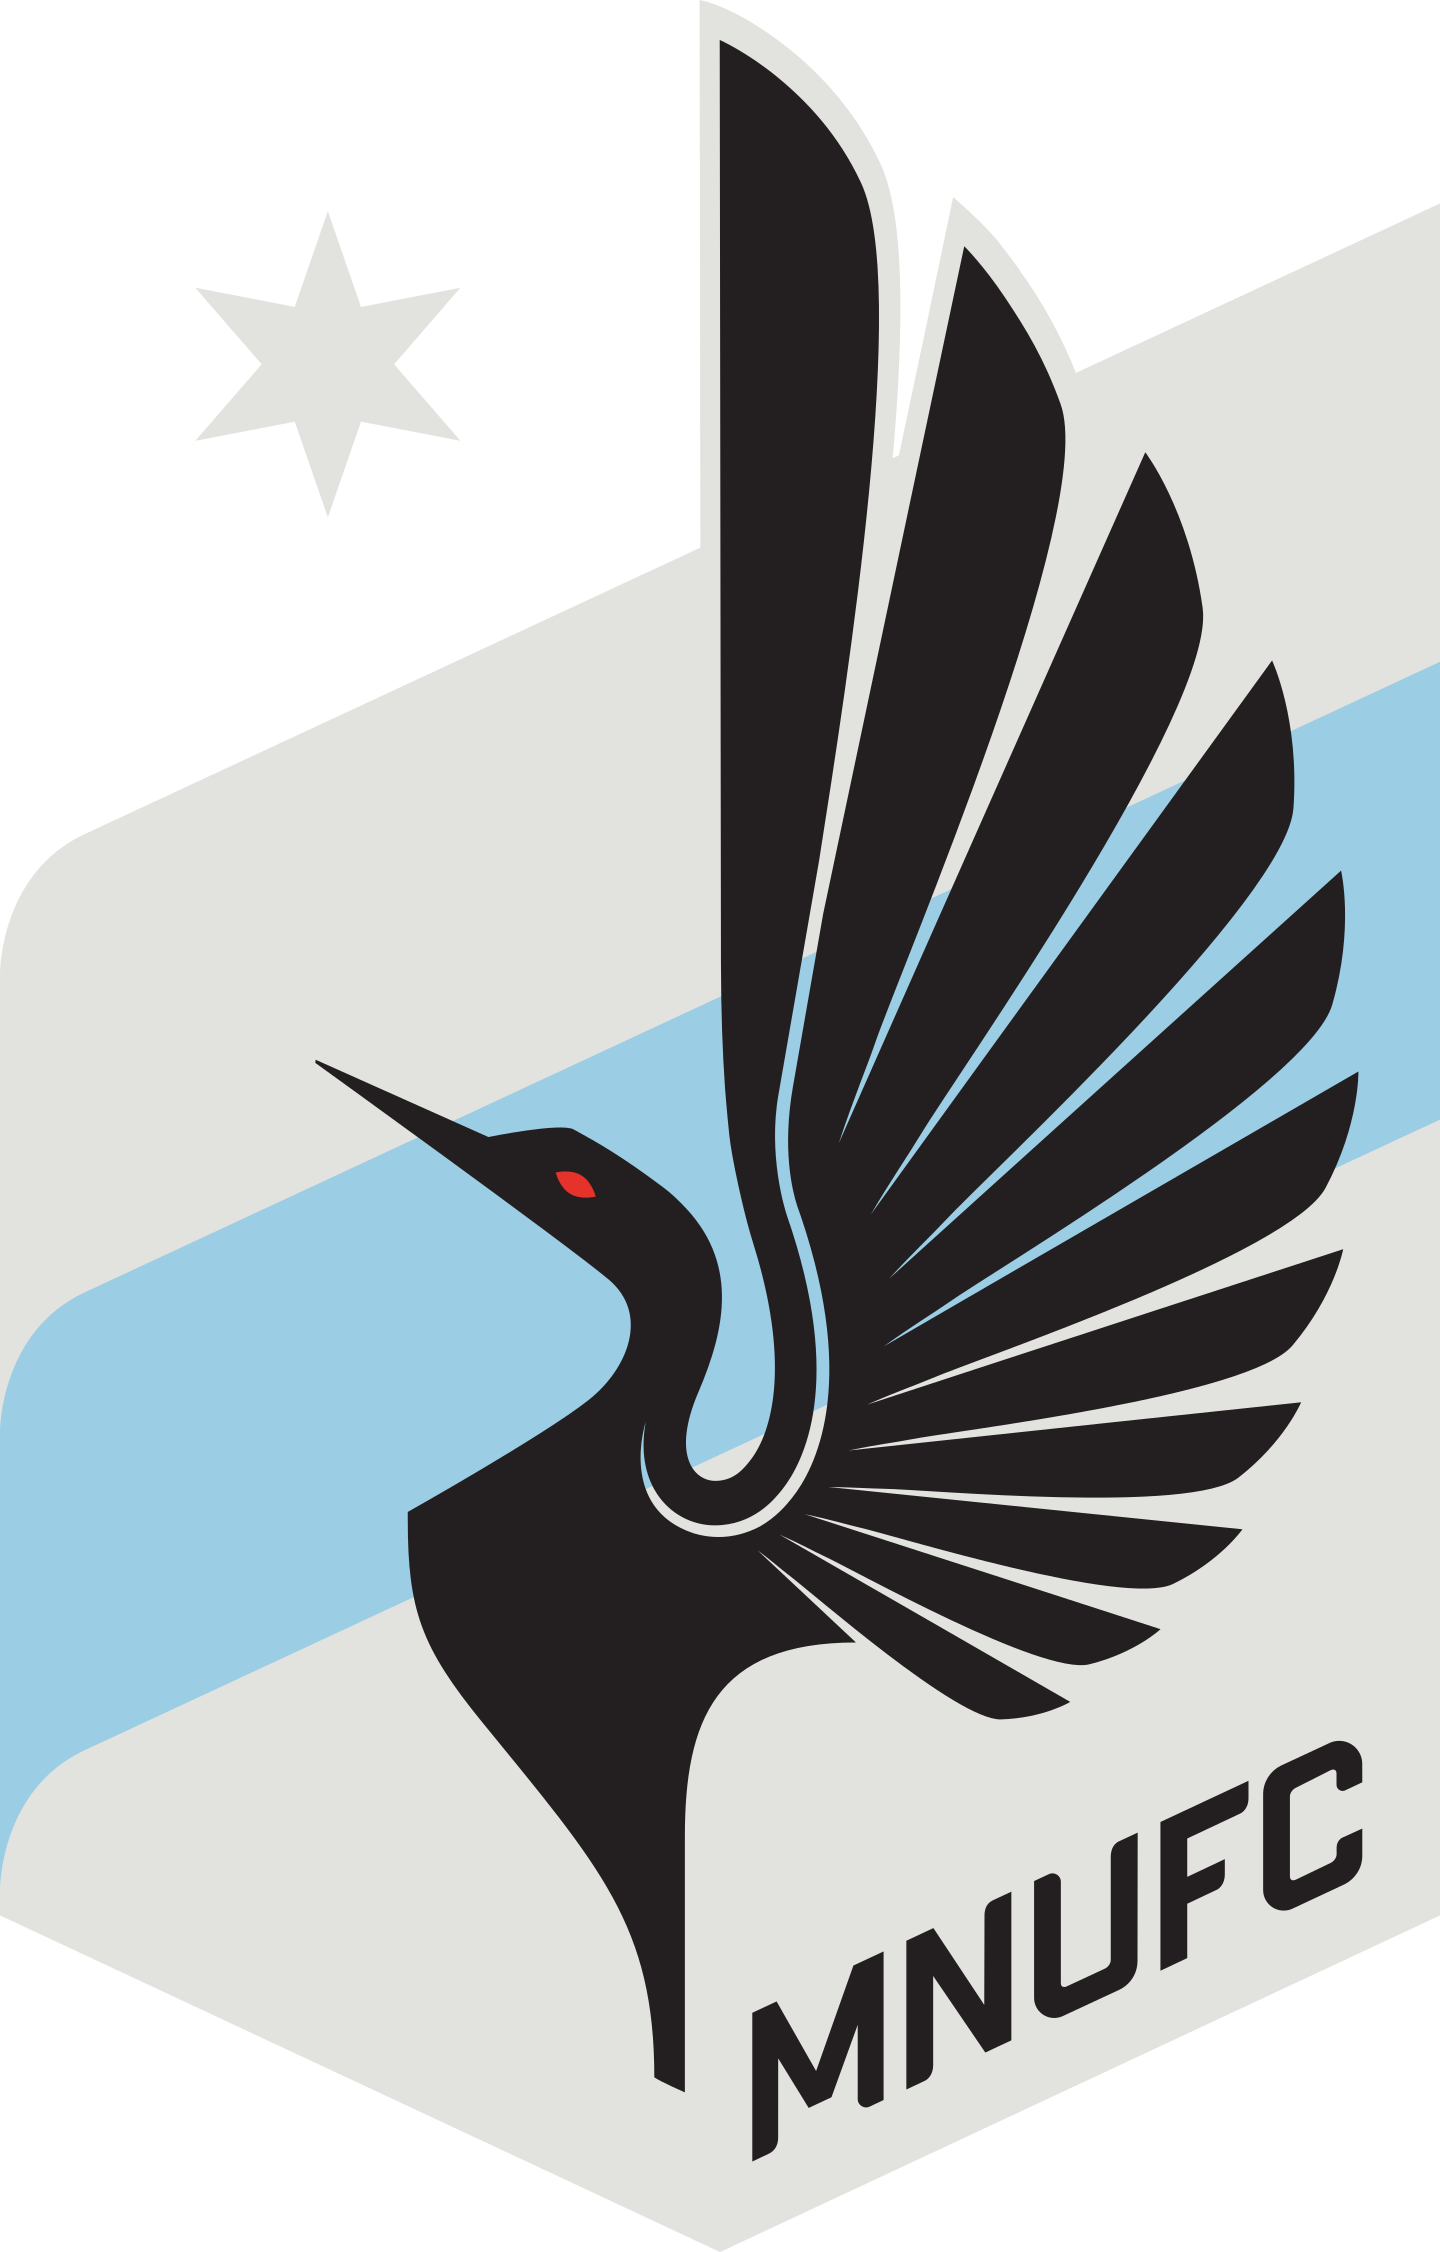 minnesota united fc logo 2 - Minnesota United FC Logo